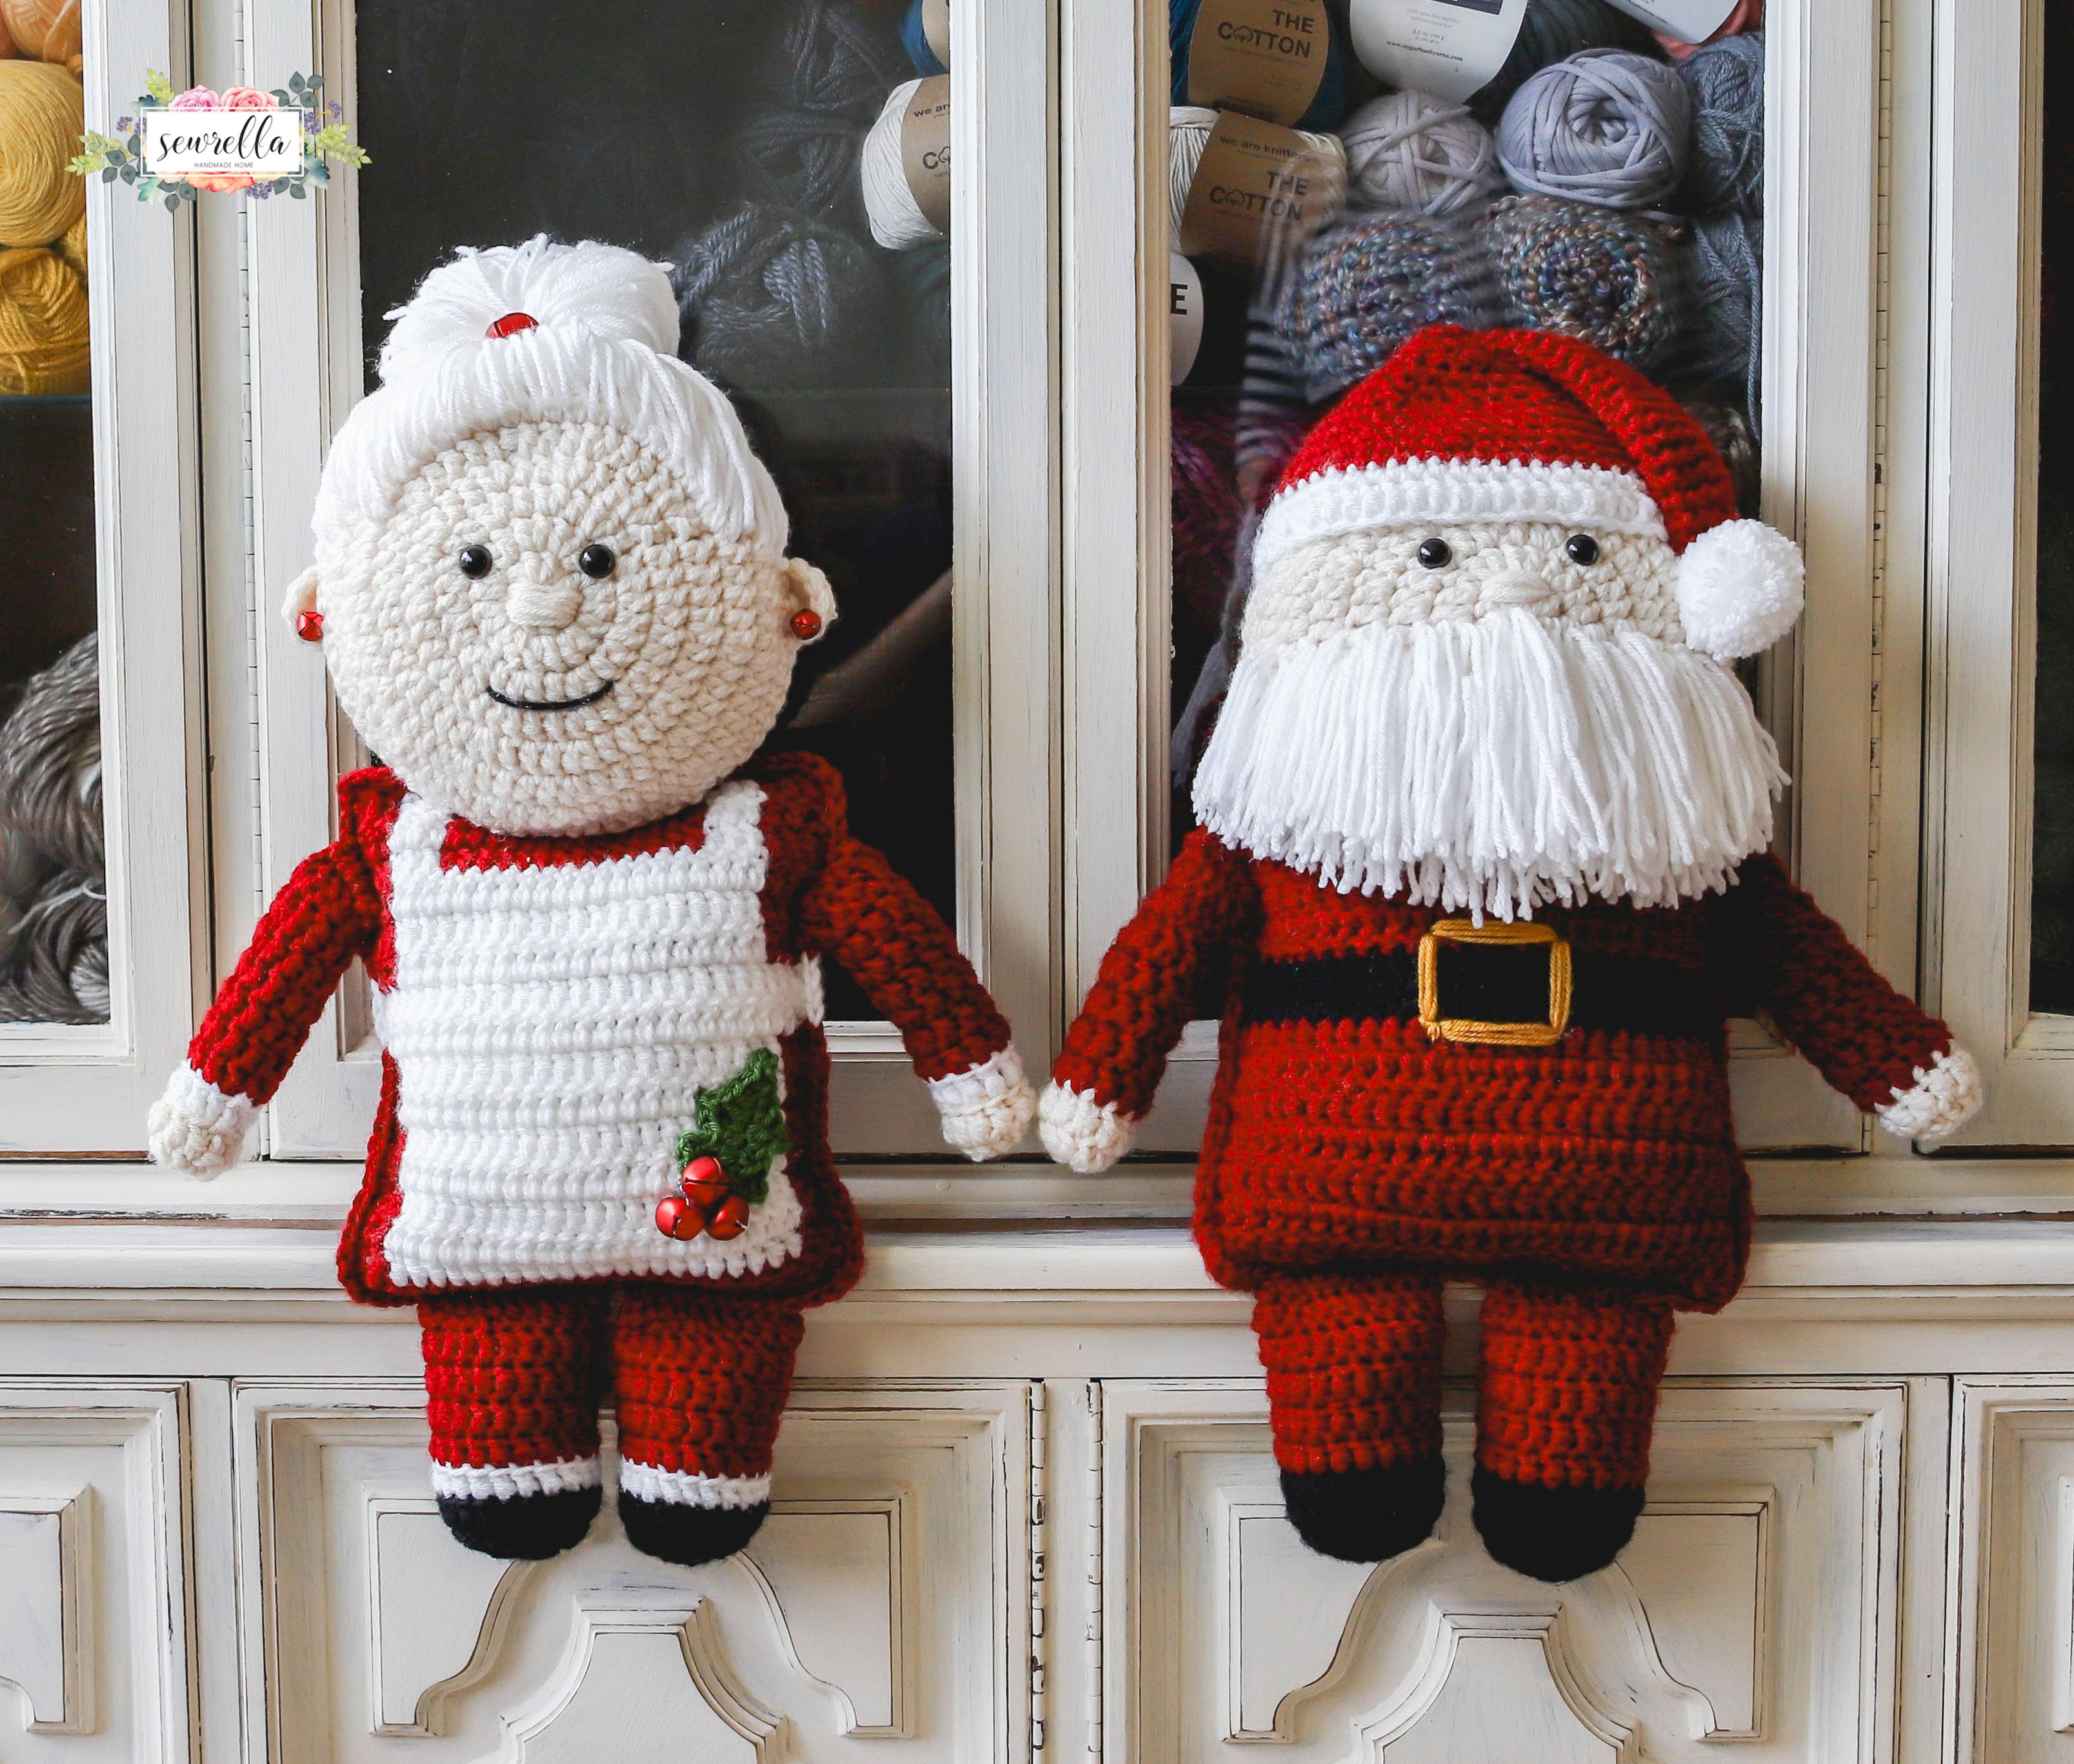 Crochet Mrs. Claus | Free pattern, Crochet and Santa